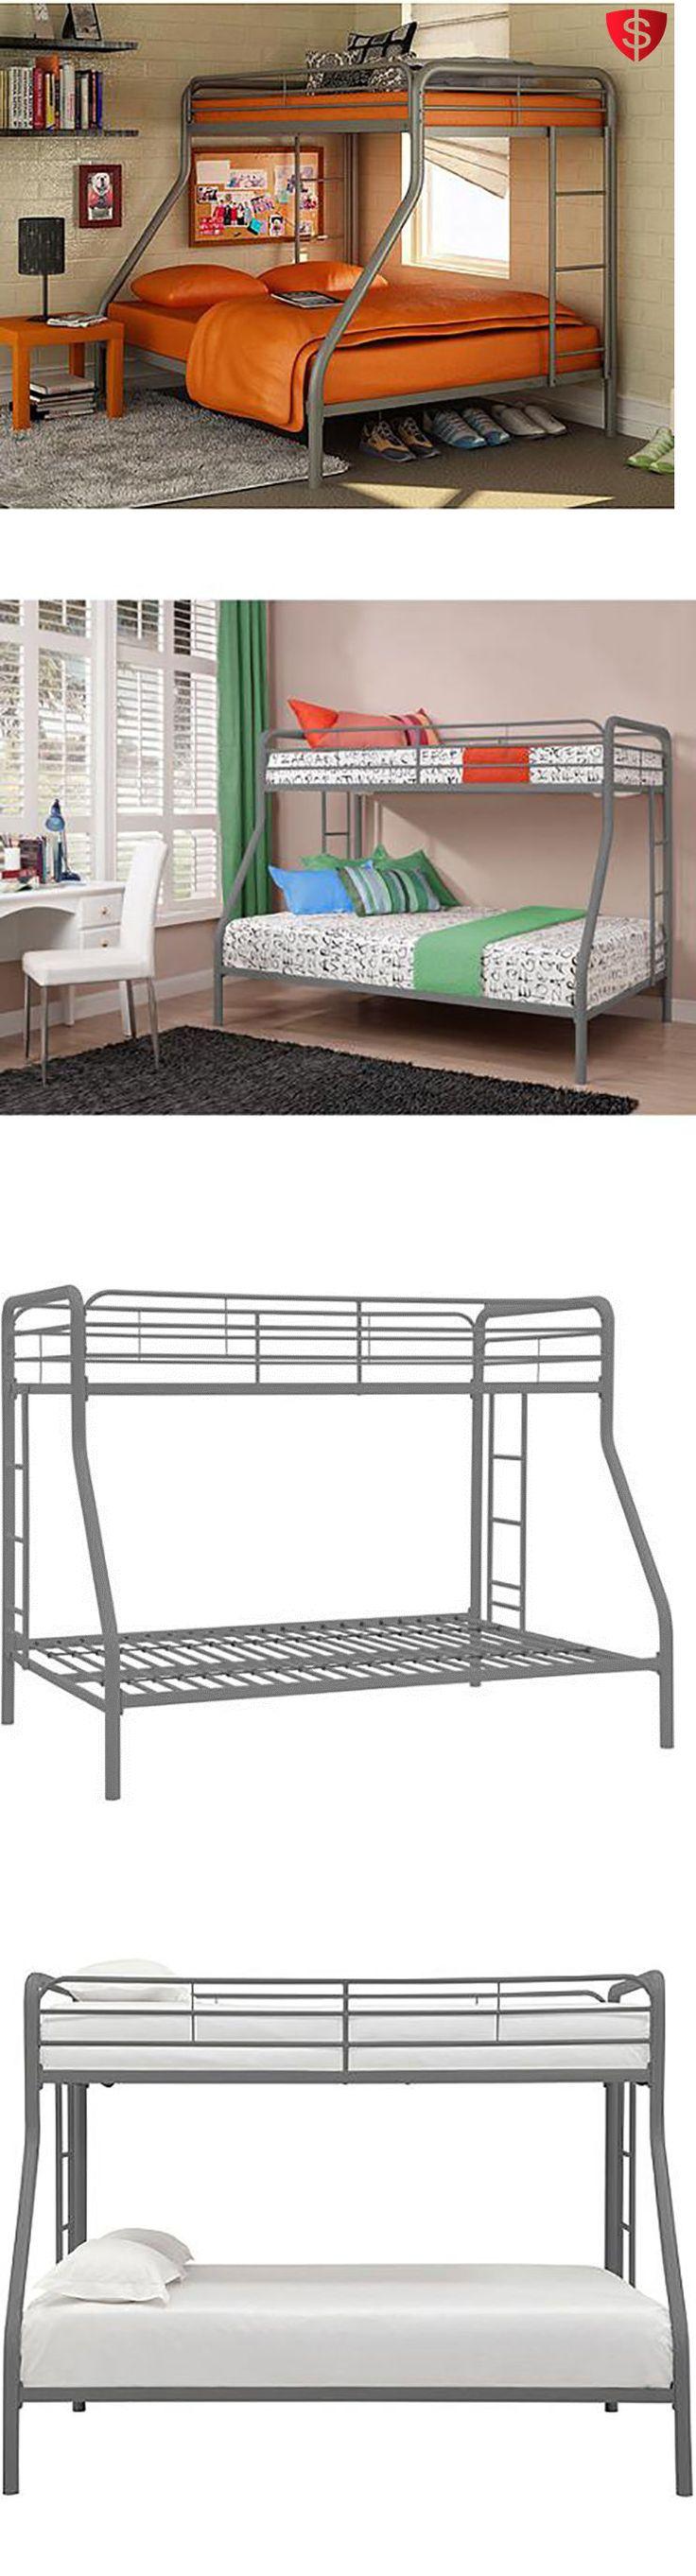 Kids Furniture: Metal Bunk Beds Twin Over Full Kids Bedroom Bed Dorm Furniture Boys Girls Ladder -> BUY IT NOW ONLY: $182.29 on eBay!